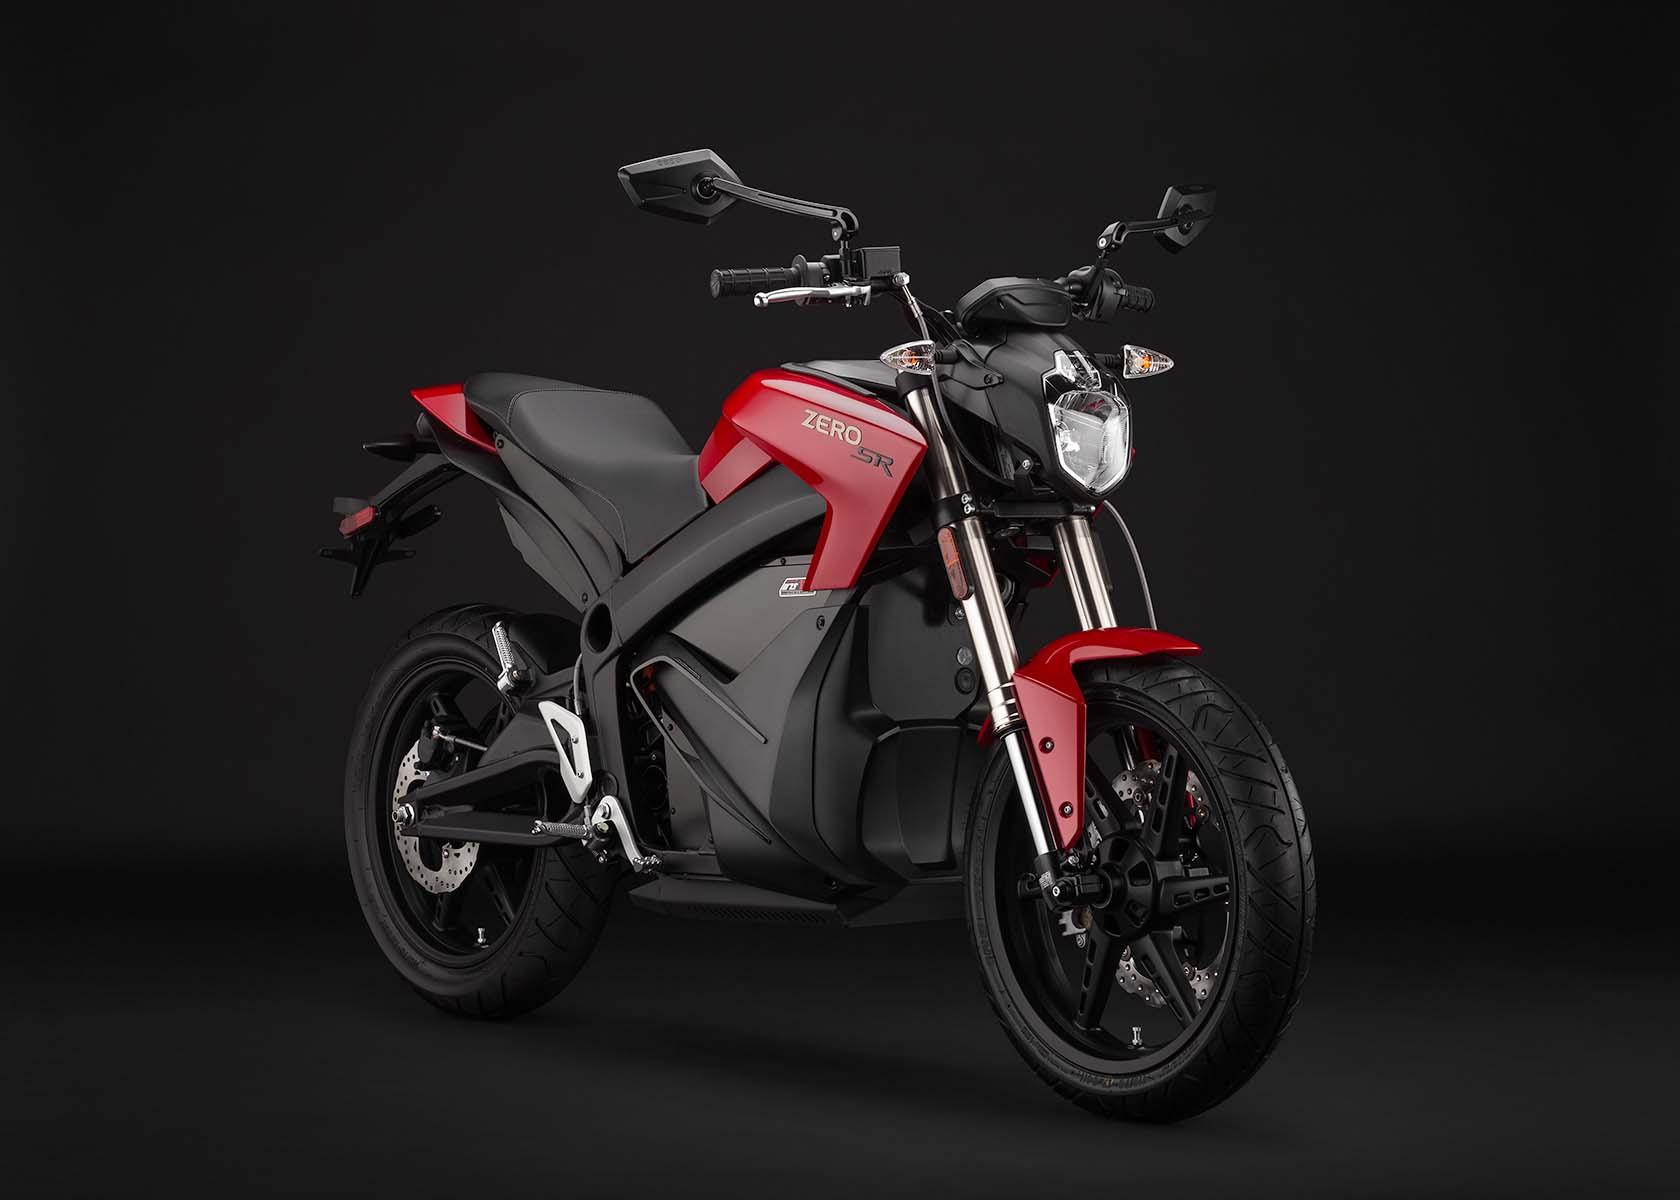 Honda V4 2019 >> Zero Motorcycles Debuts New Zero SR at EICMA - Asphalt & Rubber